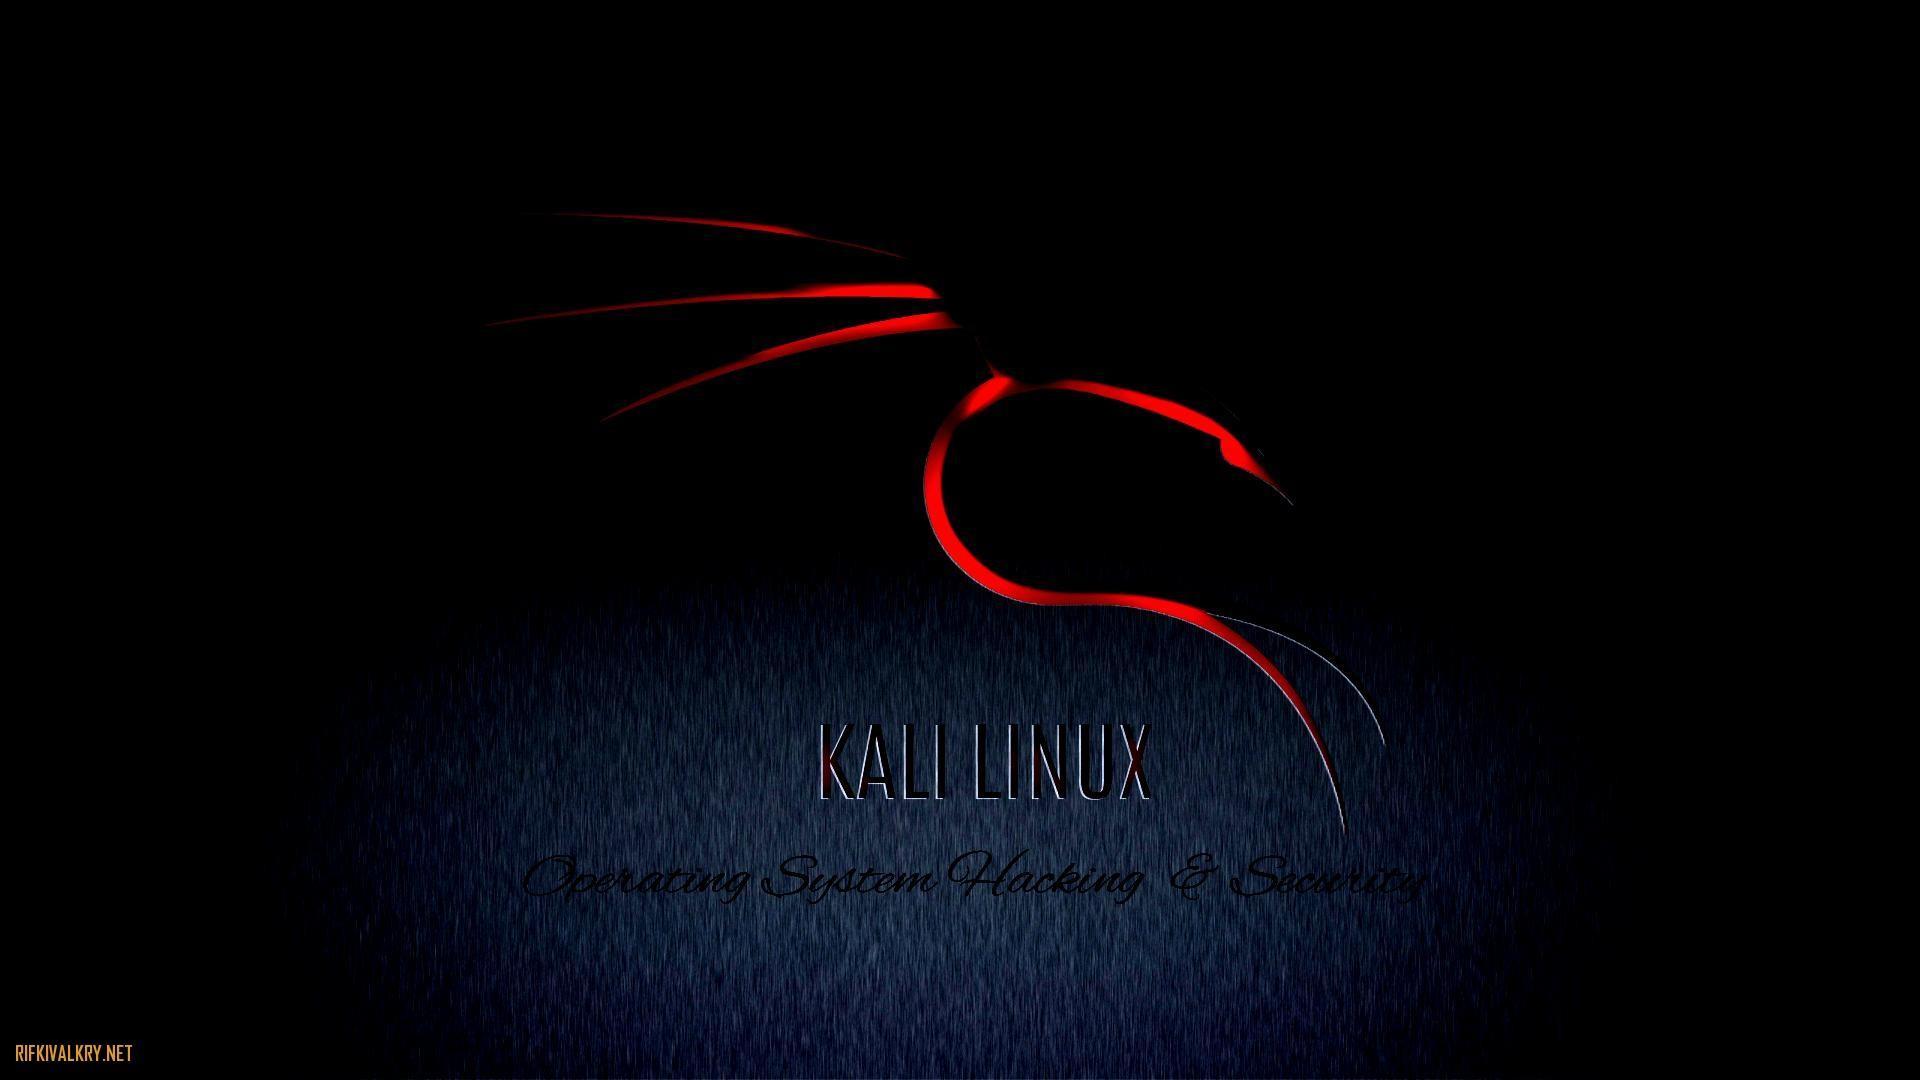 Kali Linux Wallpaper Github ✓ The Galleries of HD Wallpaper